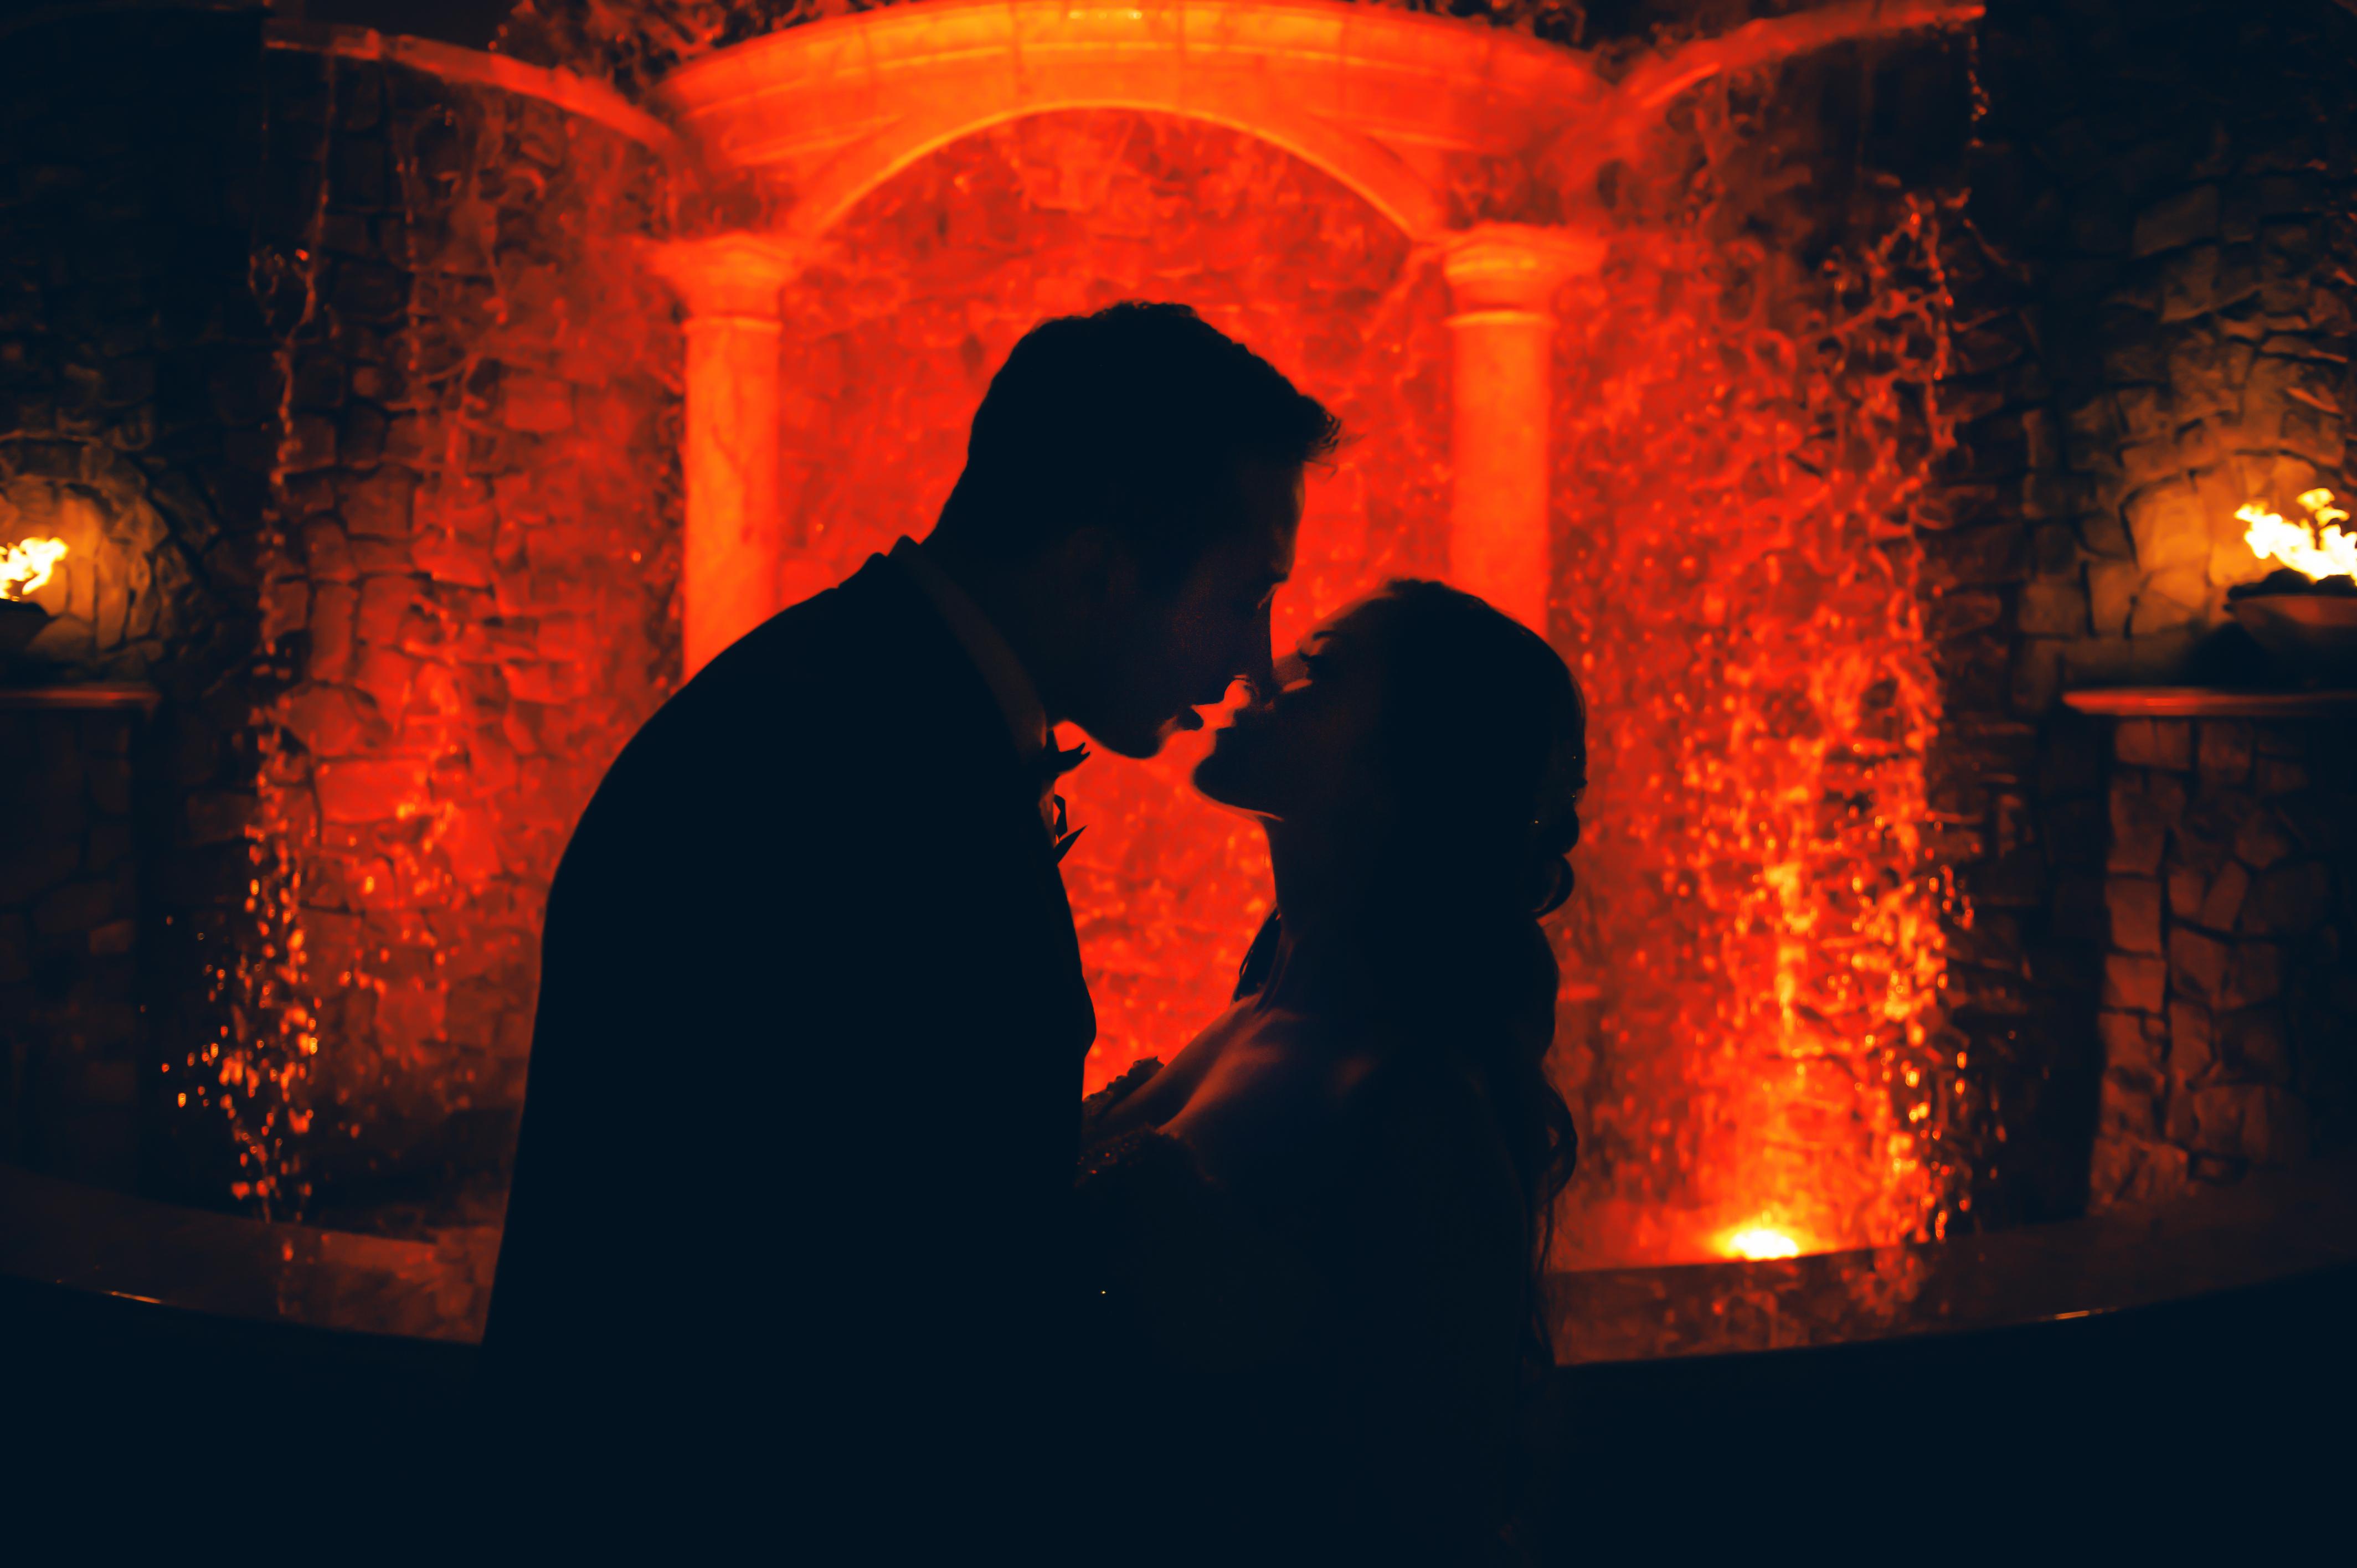 Matthew and Kelly Wedding Photos - The Venetian, Garfield NJ ...